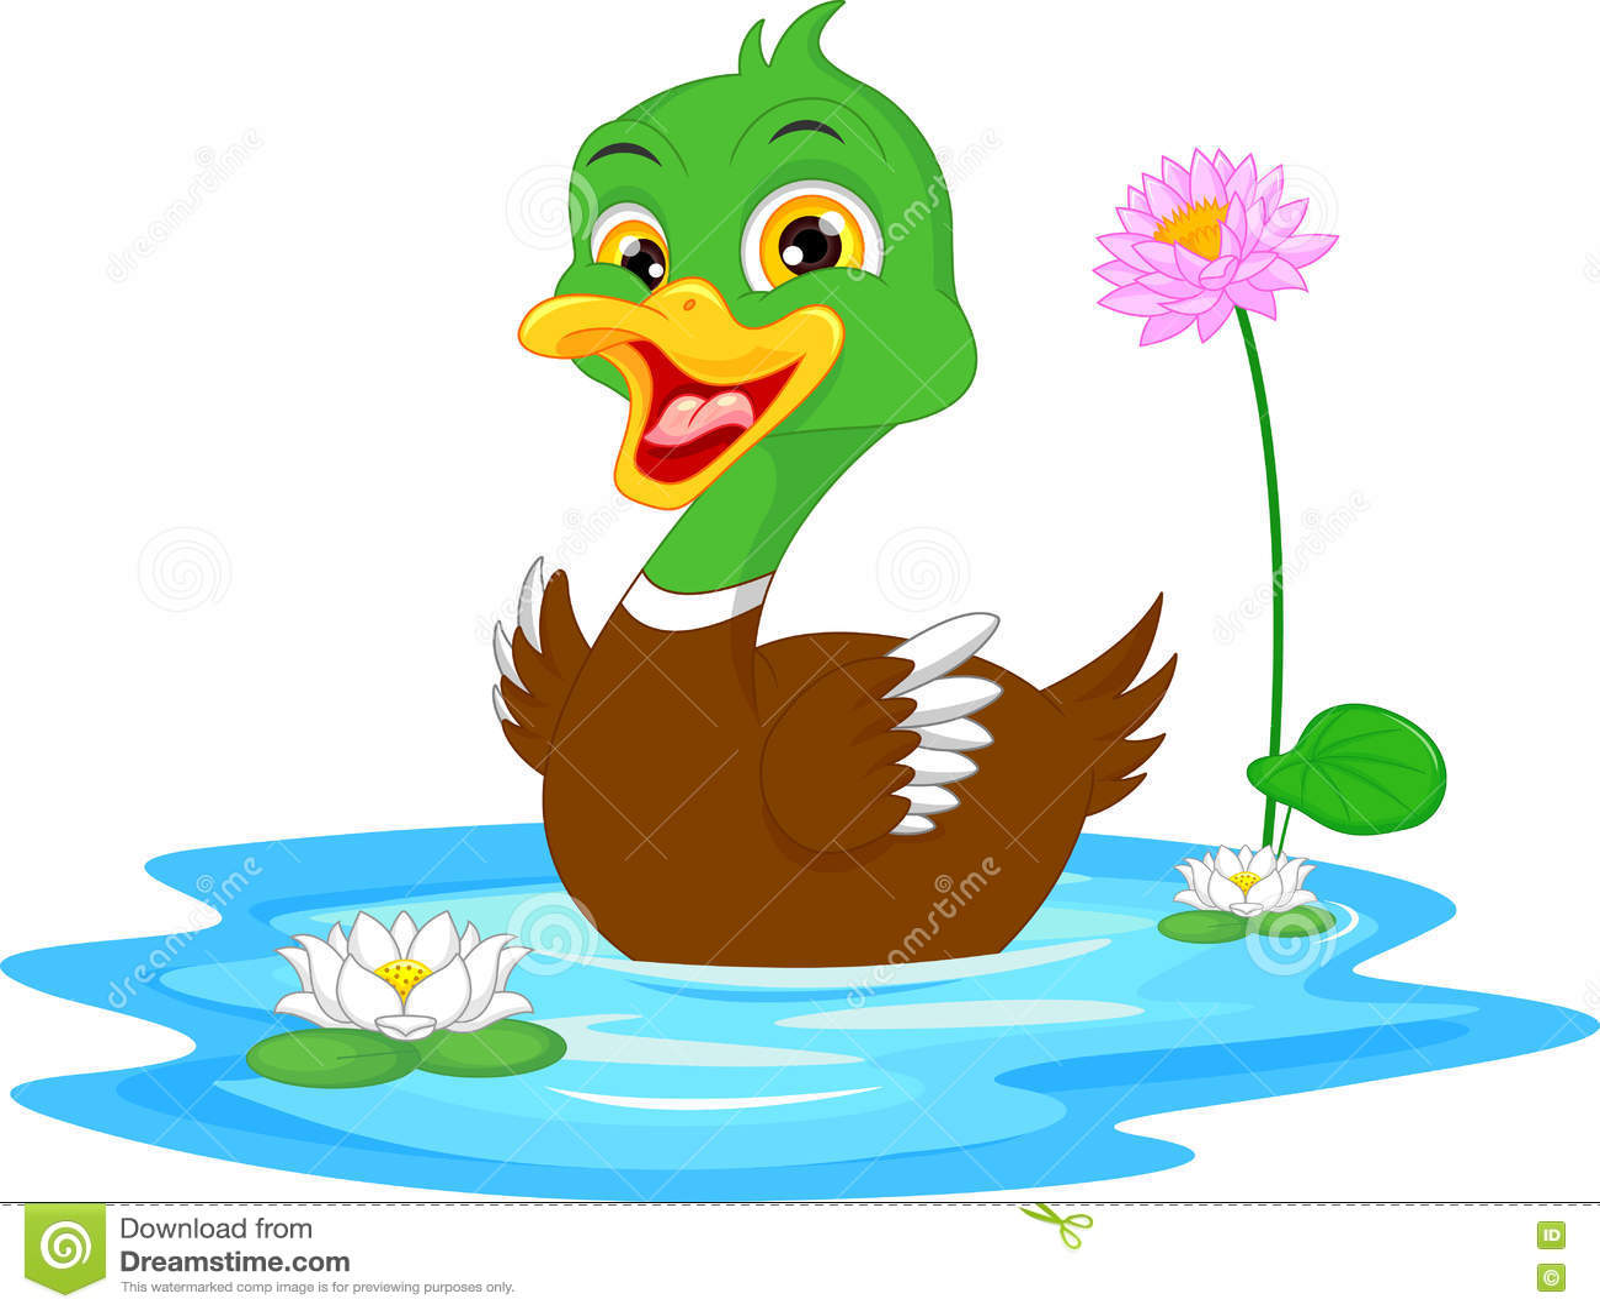 Cartoon duck swimming stock vector. Illustration of ...